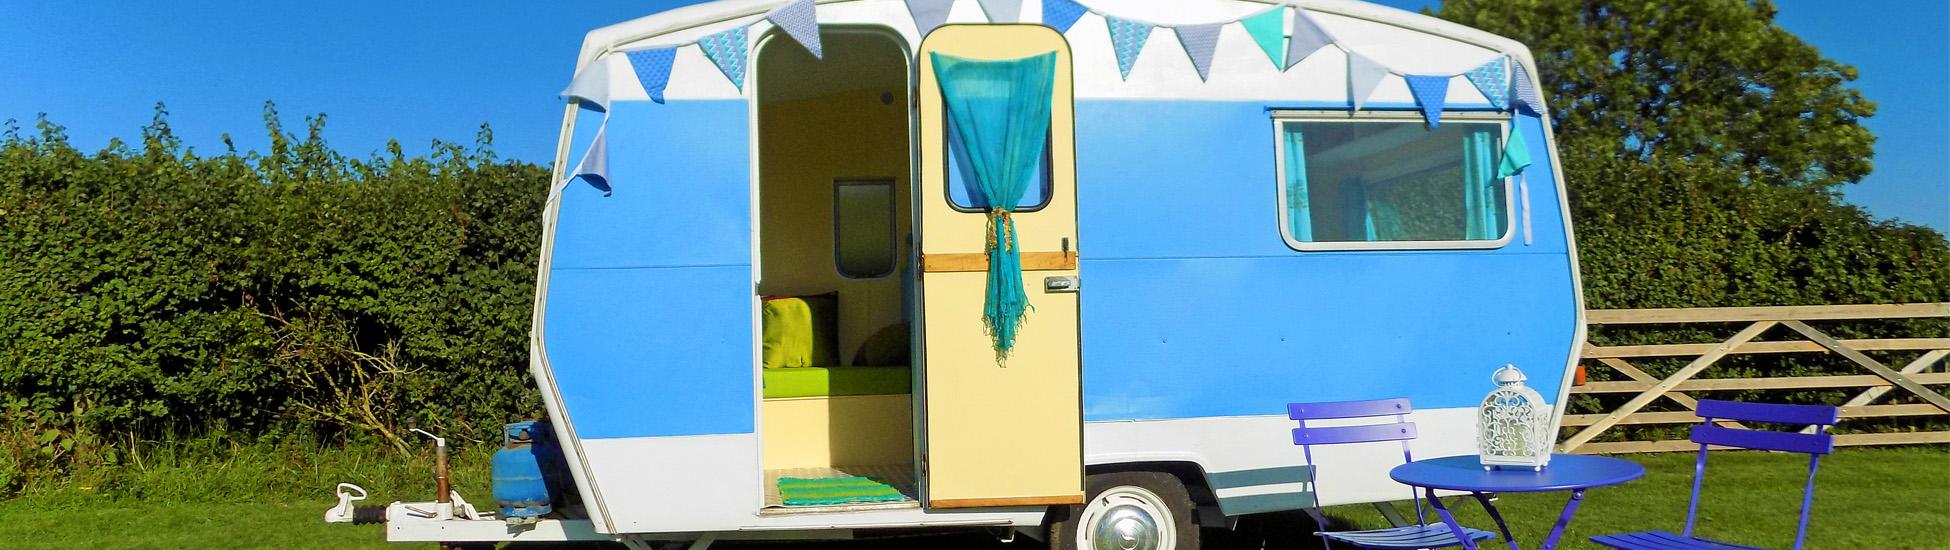 new caravan